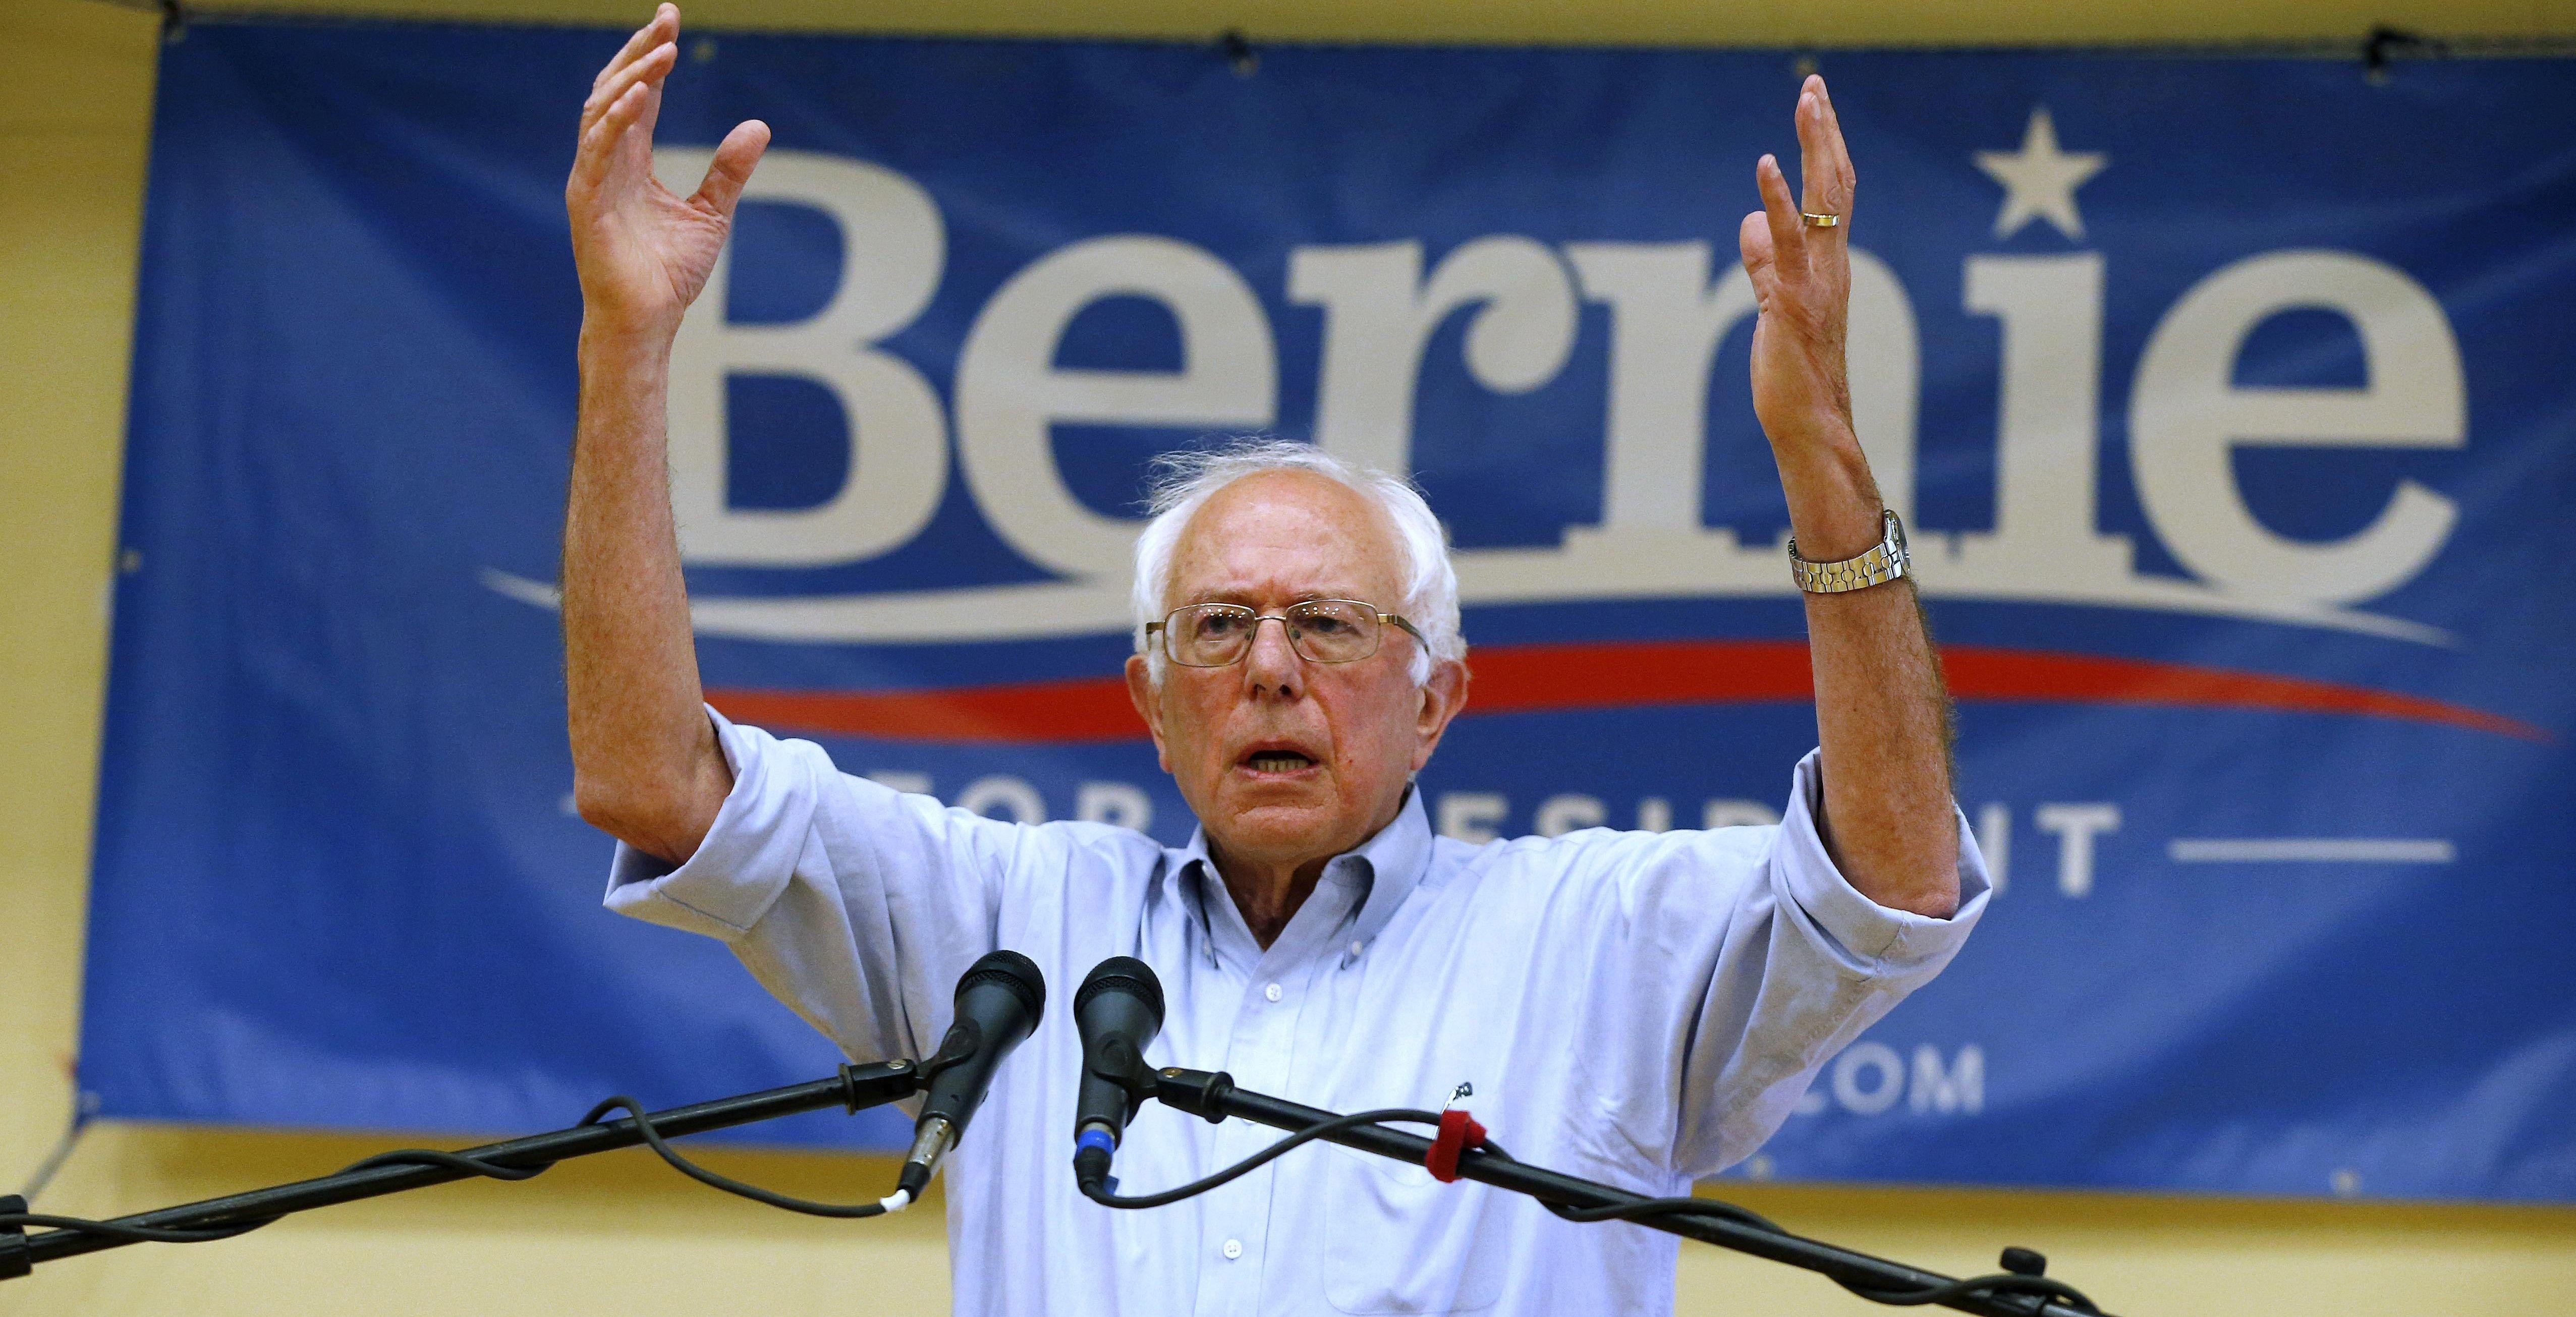 12 Reasons Bernie Sanders Would Make A Great President